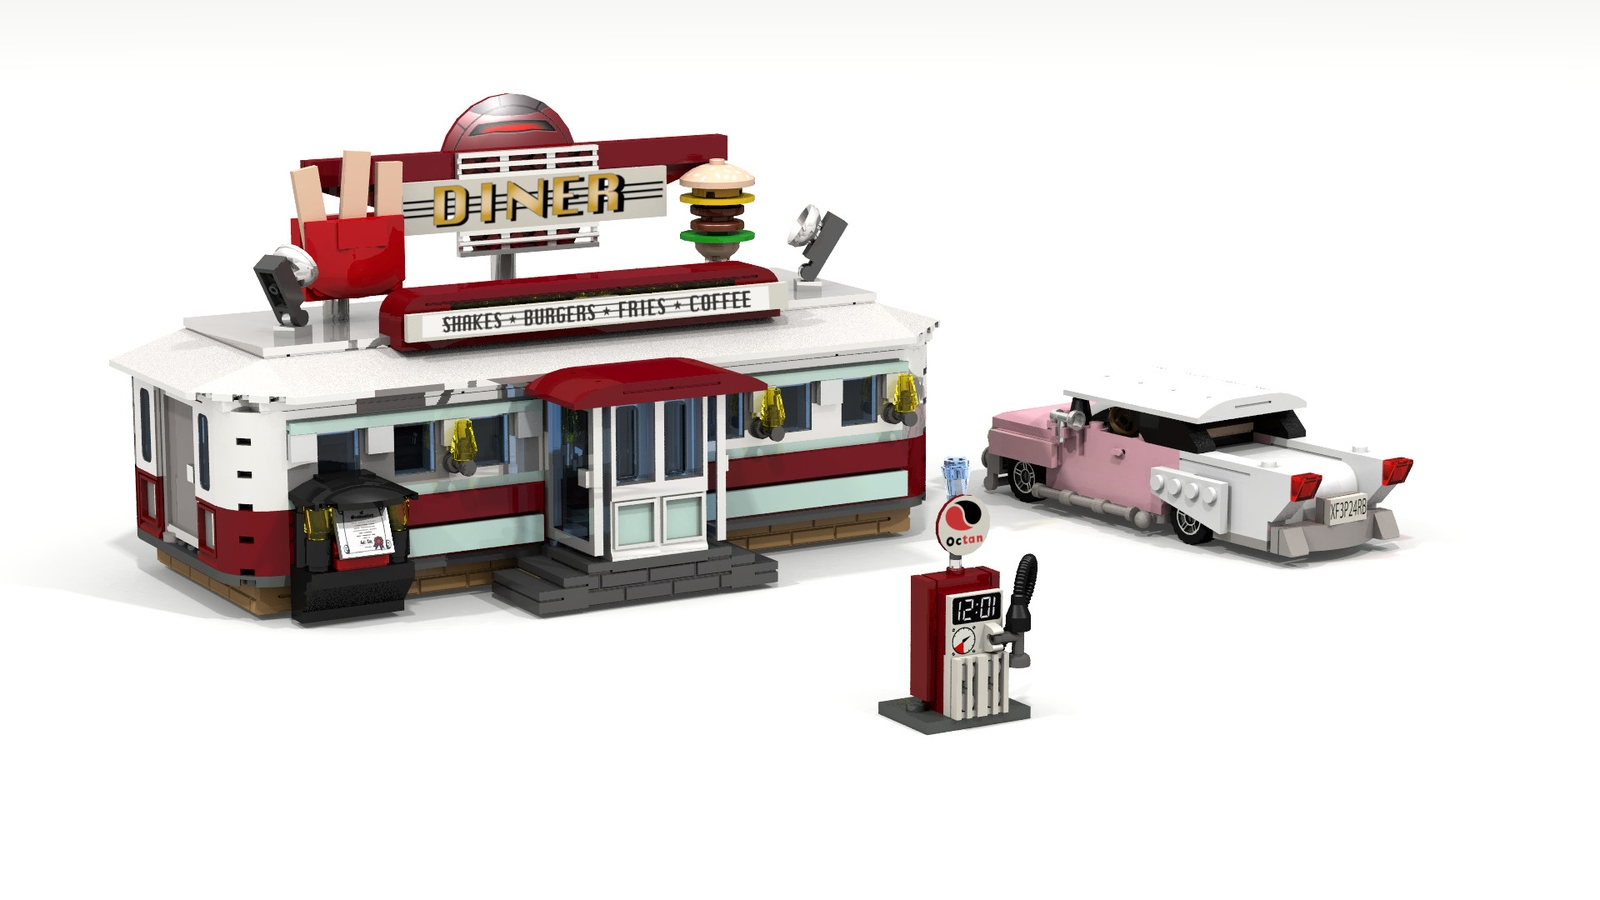 LEGO IDEAS - Product Ideas - 1950's Diner